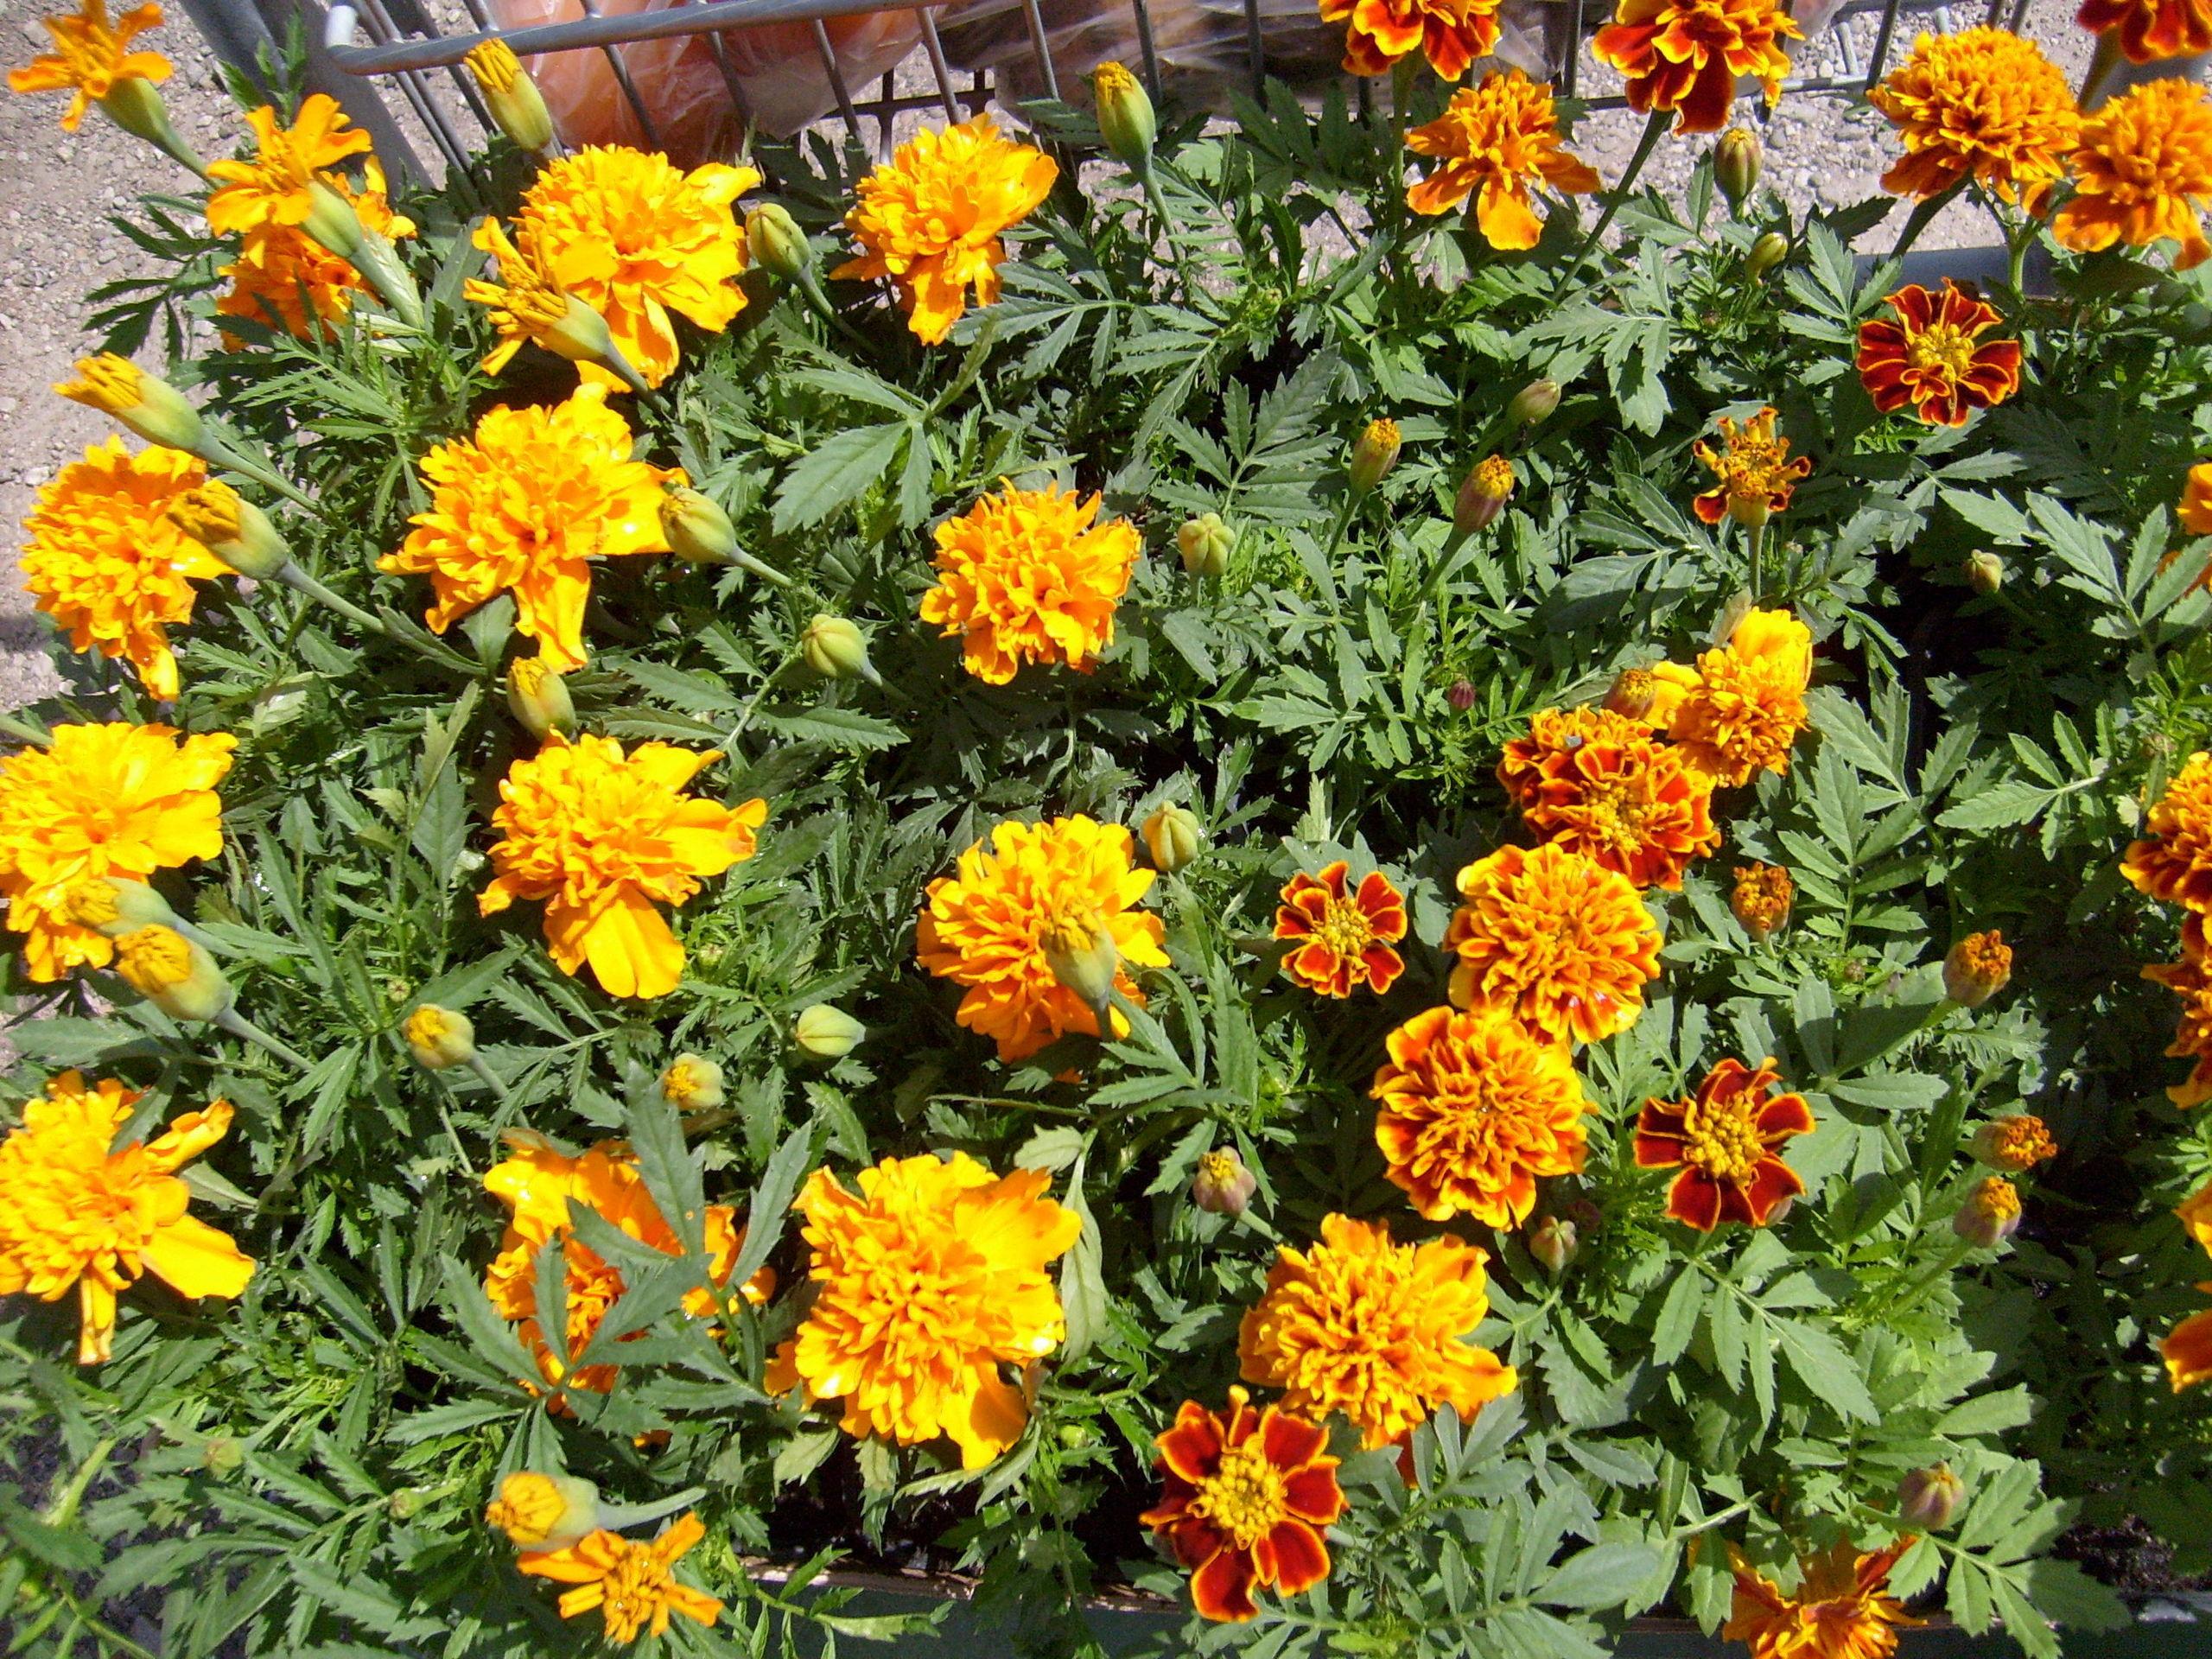 Spring Flowers Gardening Wallpaper 1417289 Fanpop